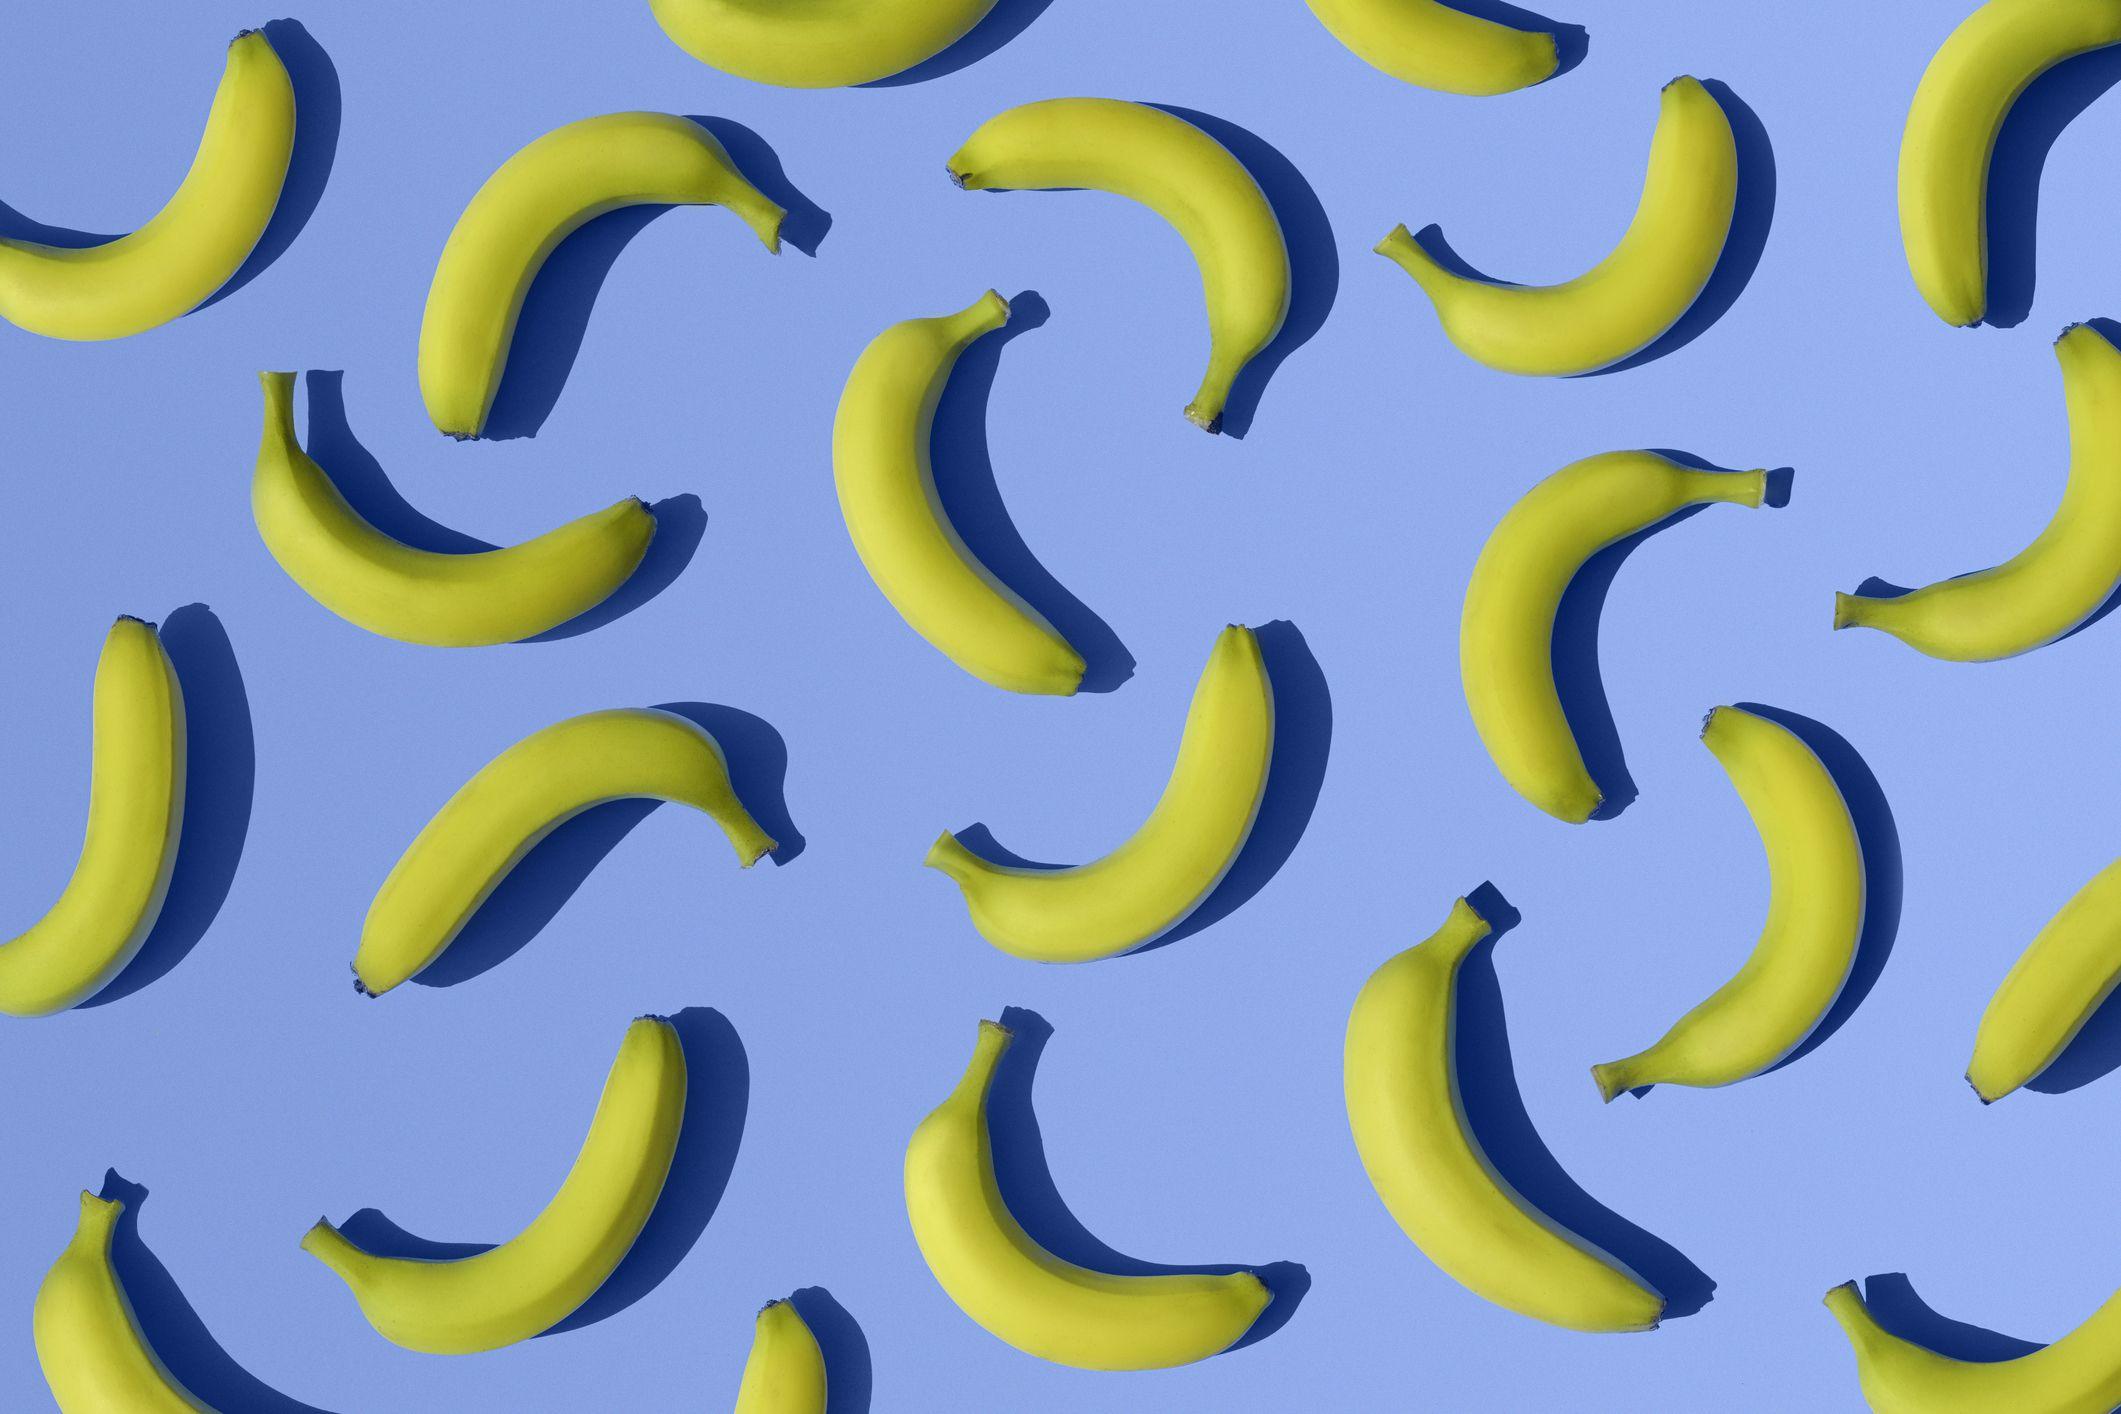 banana-stock